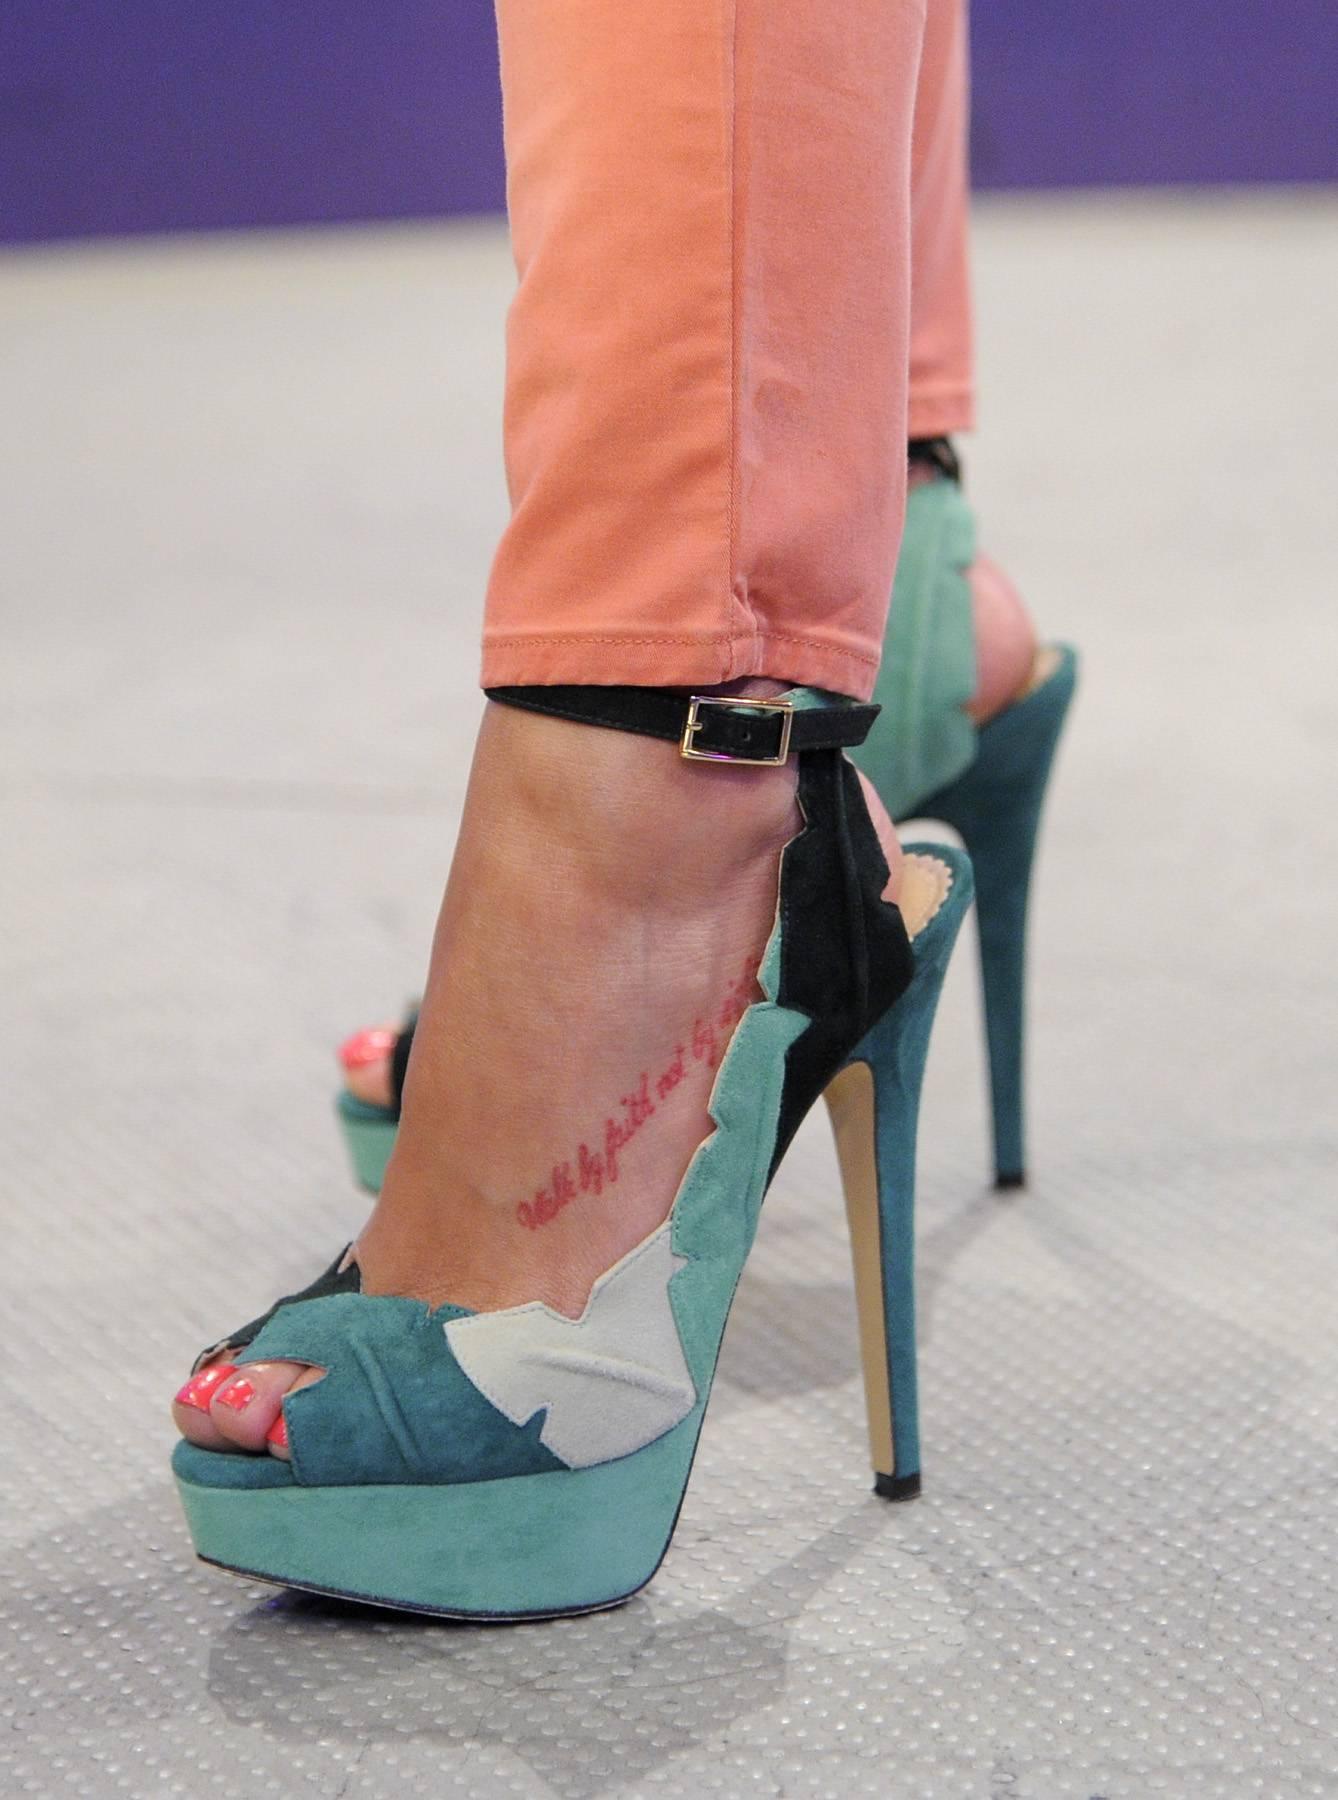 Stilts - Nobody rocks a pair of high, high, high heels like Rocsi does!(Photo: John Ricard/BET)